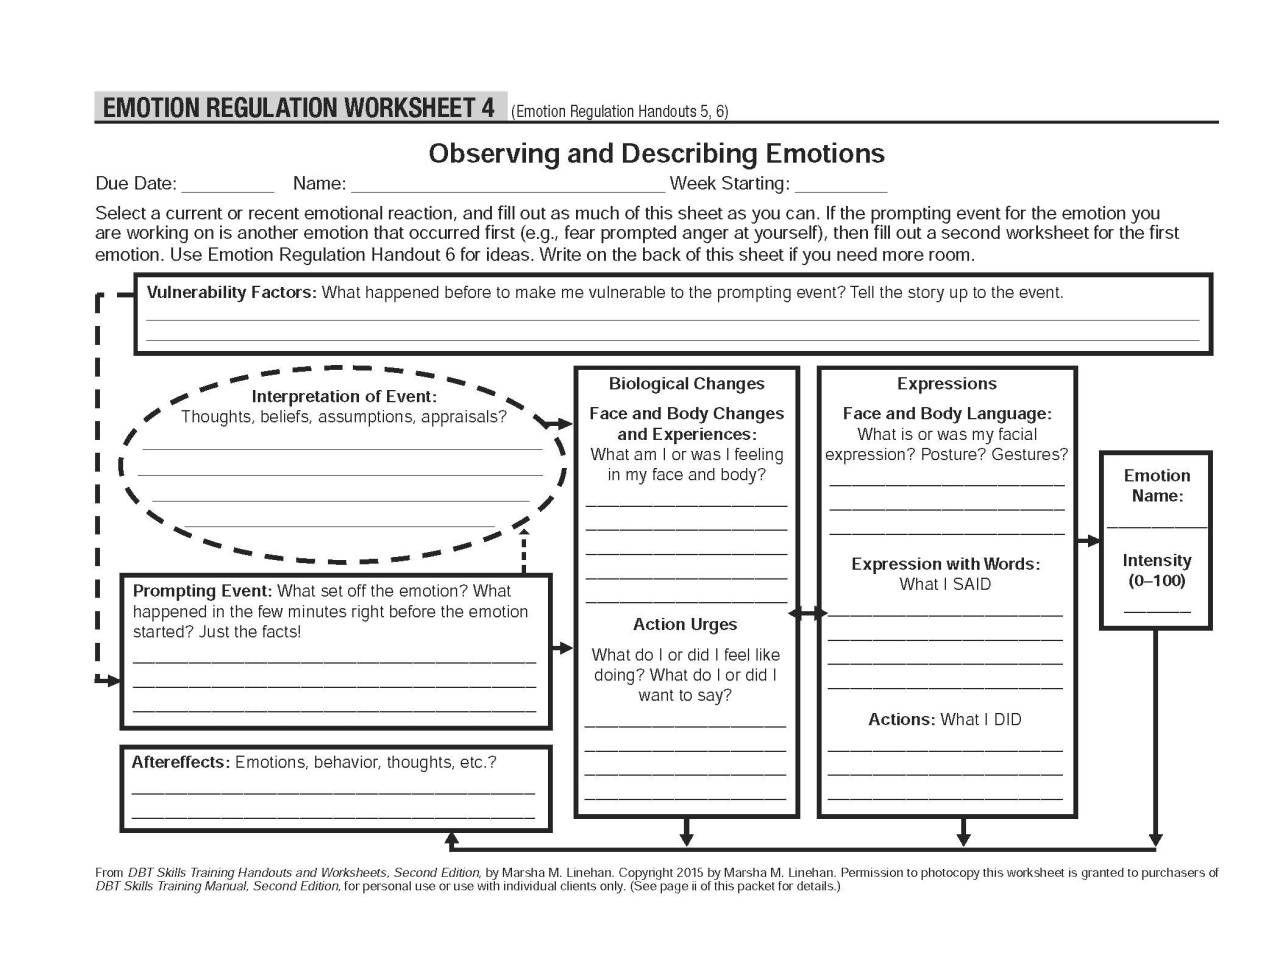 Healing Schemas Dbt Self Help Resources Observing And Describing